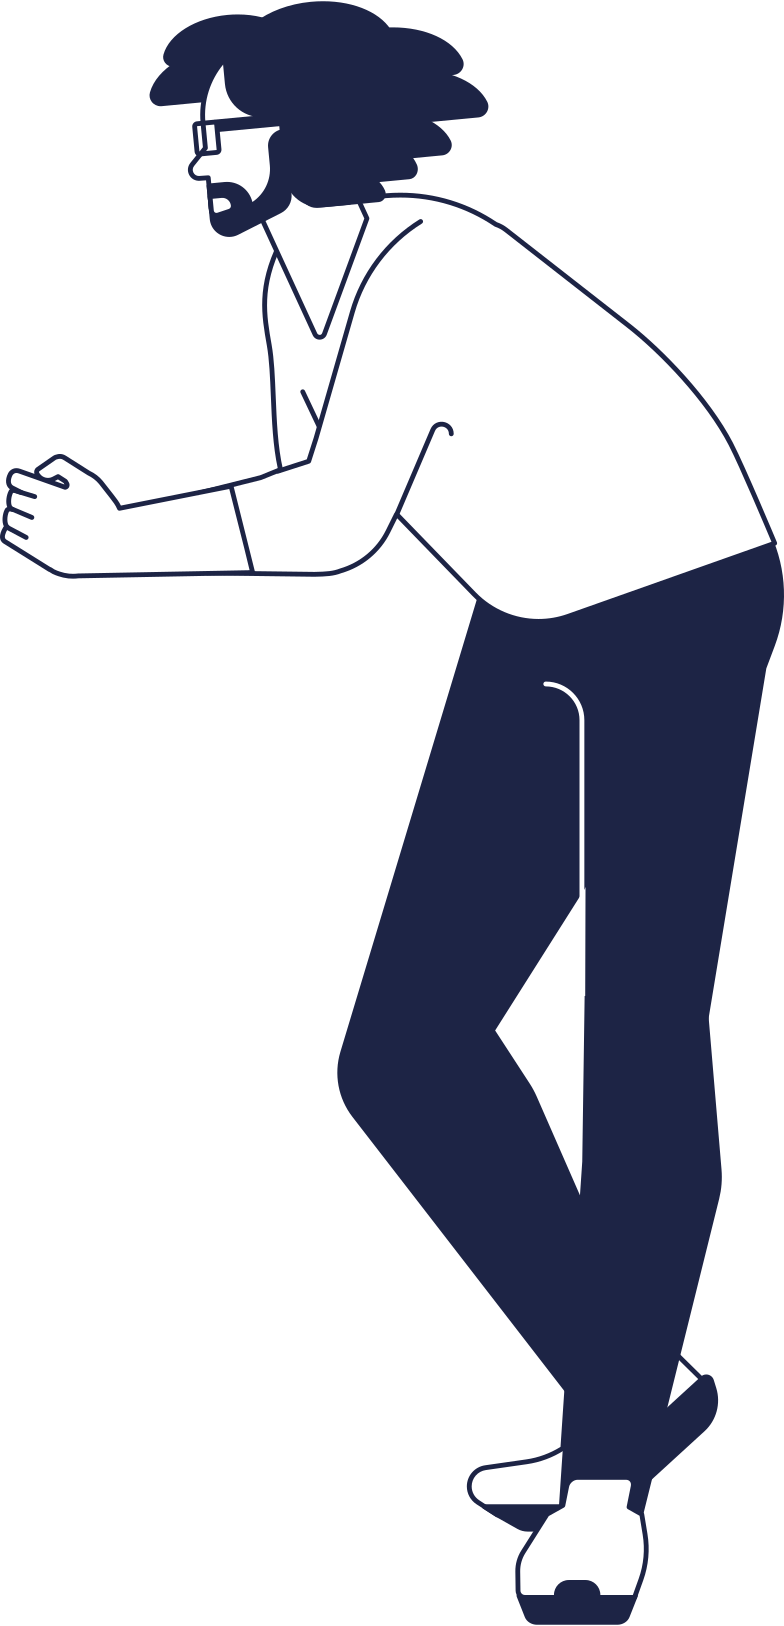 man at standing cafe Clipart illustration in PNG, SVG